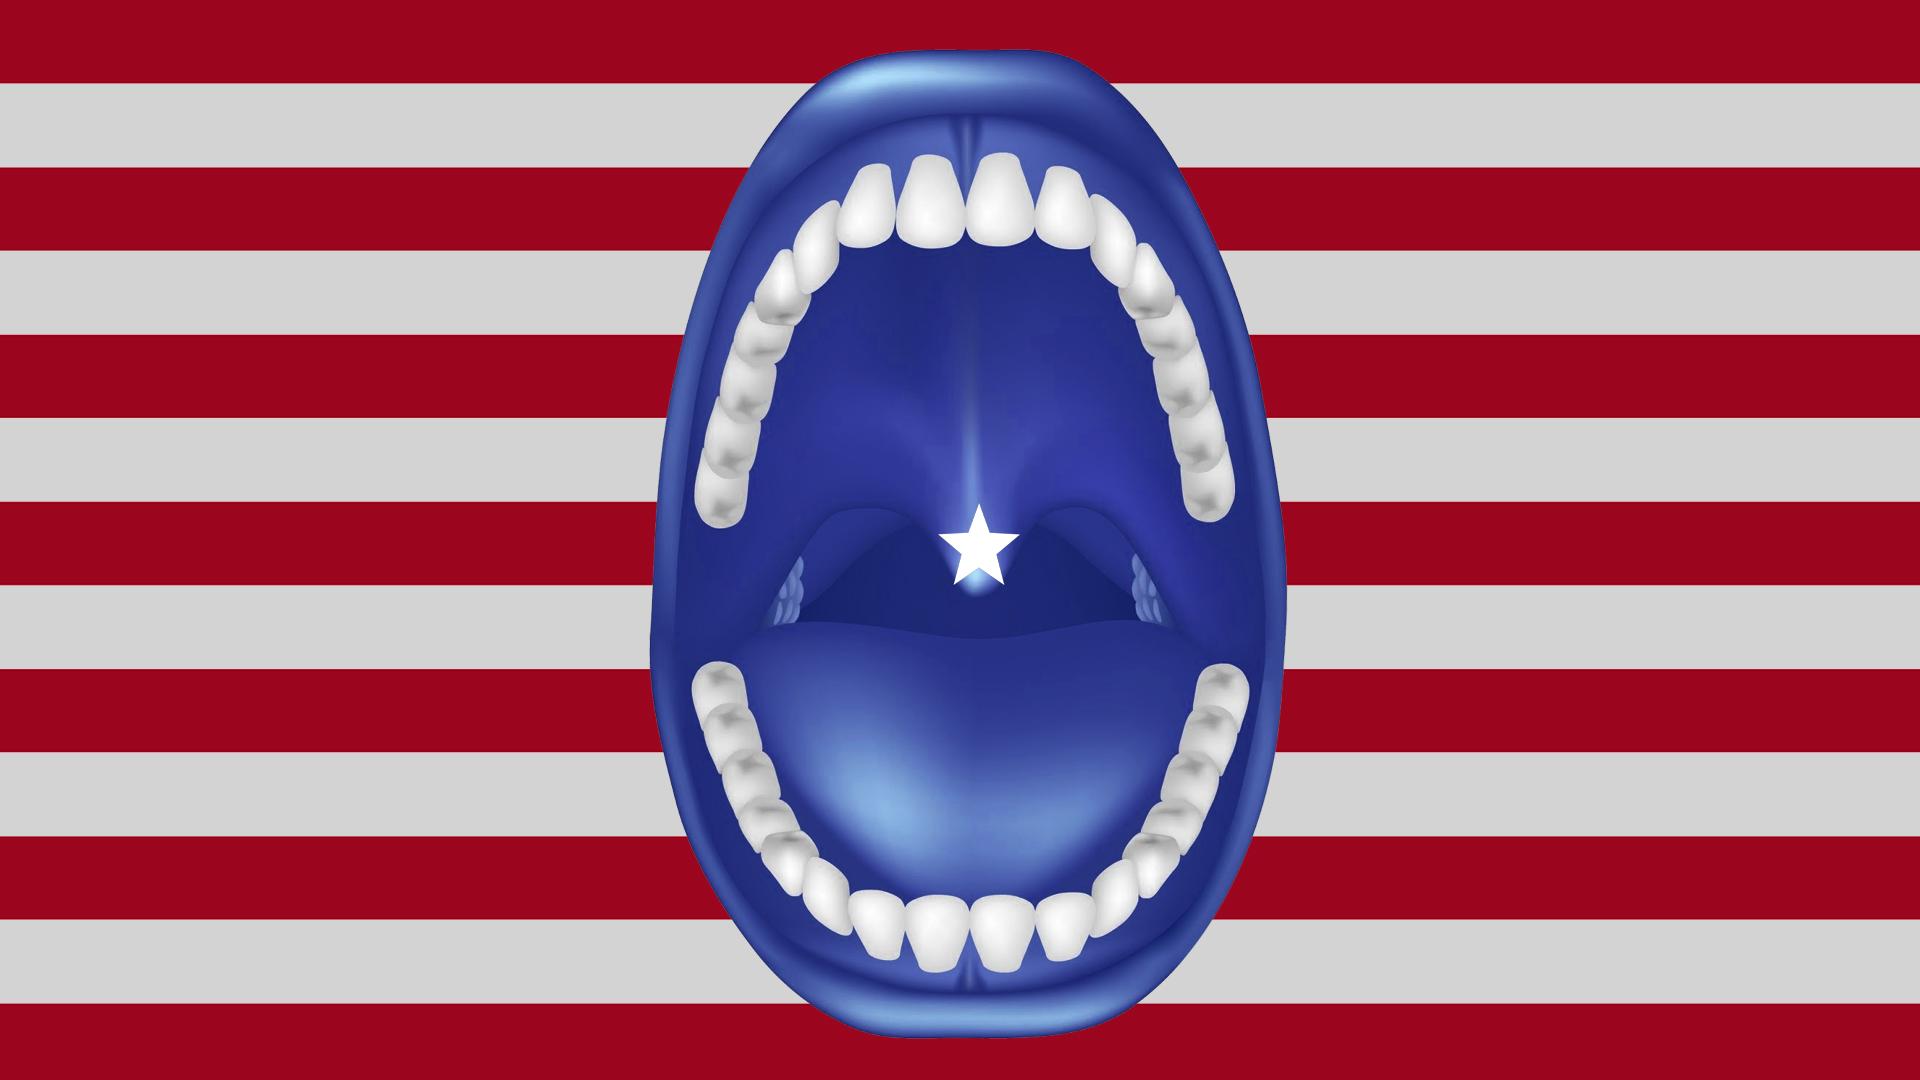 AmericasMoralGagReflex.jpg